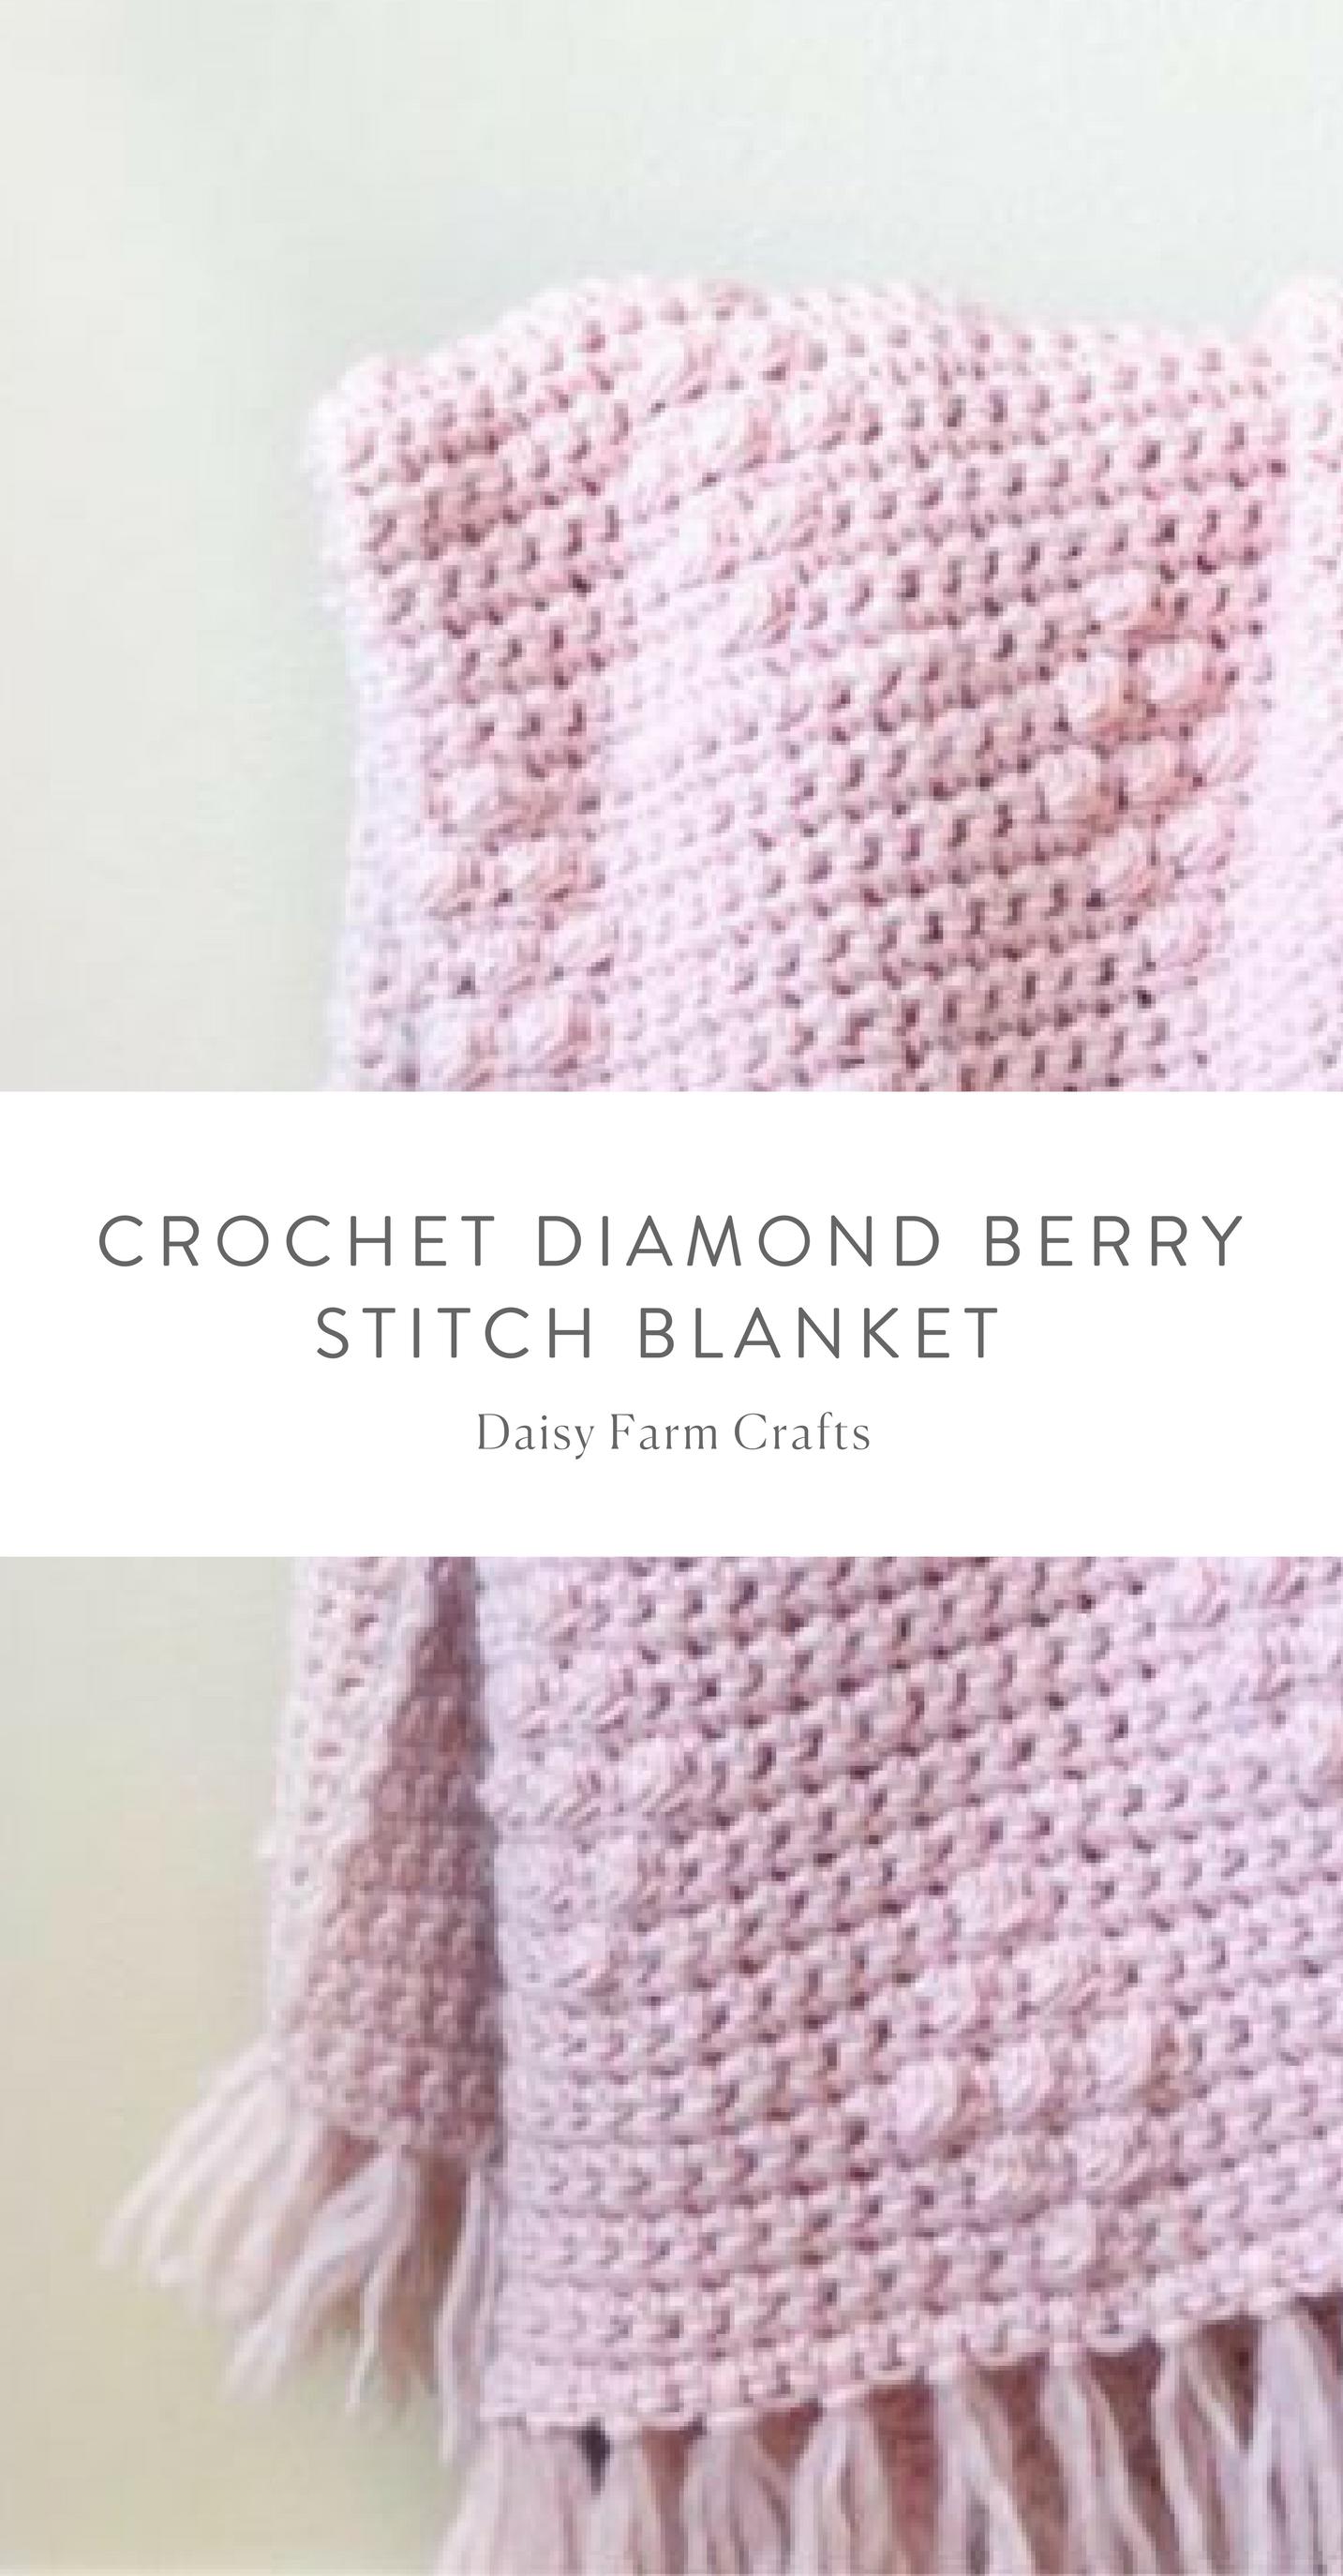 Free Pattern - Crochet Diamond Berry Stitch Blanket | CROCHETING ...